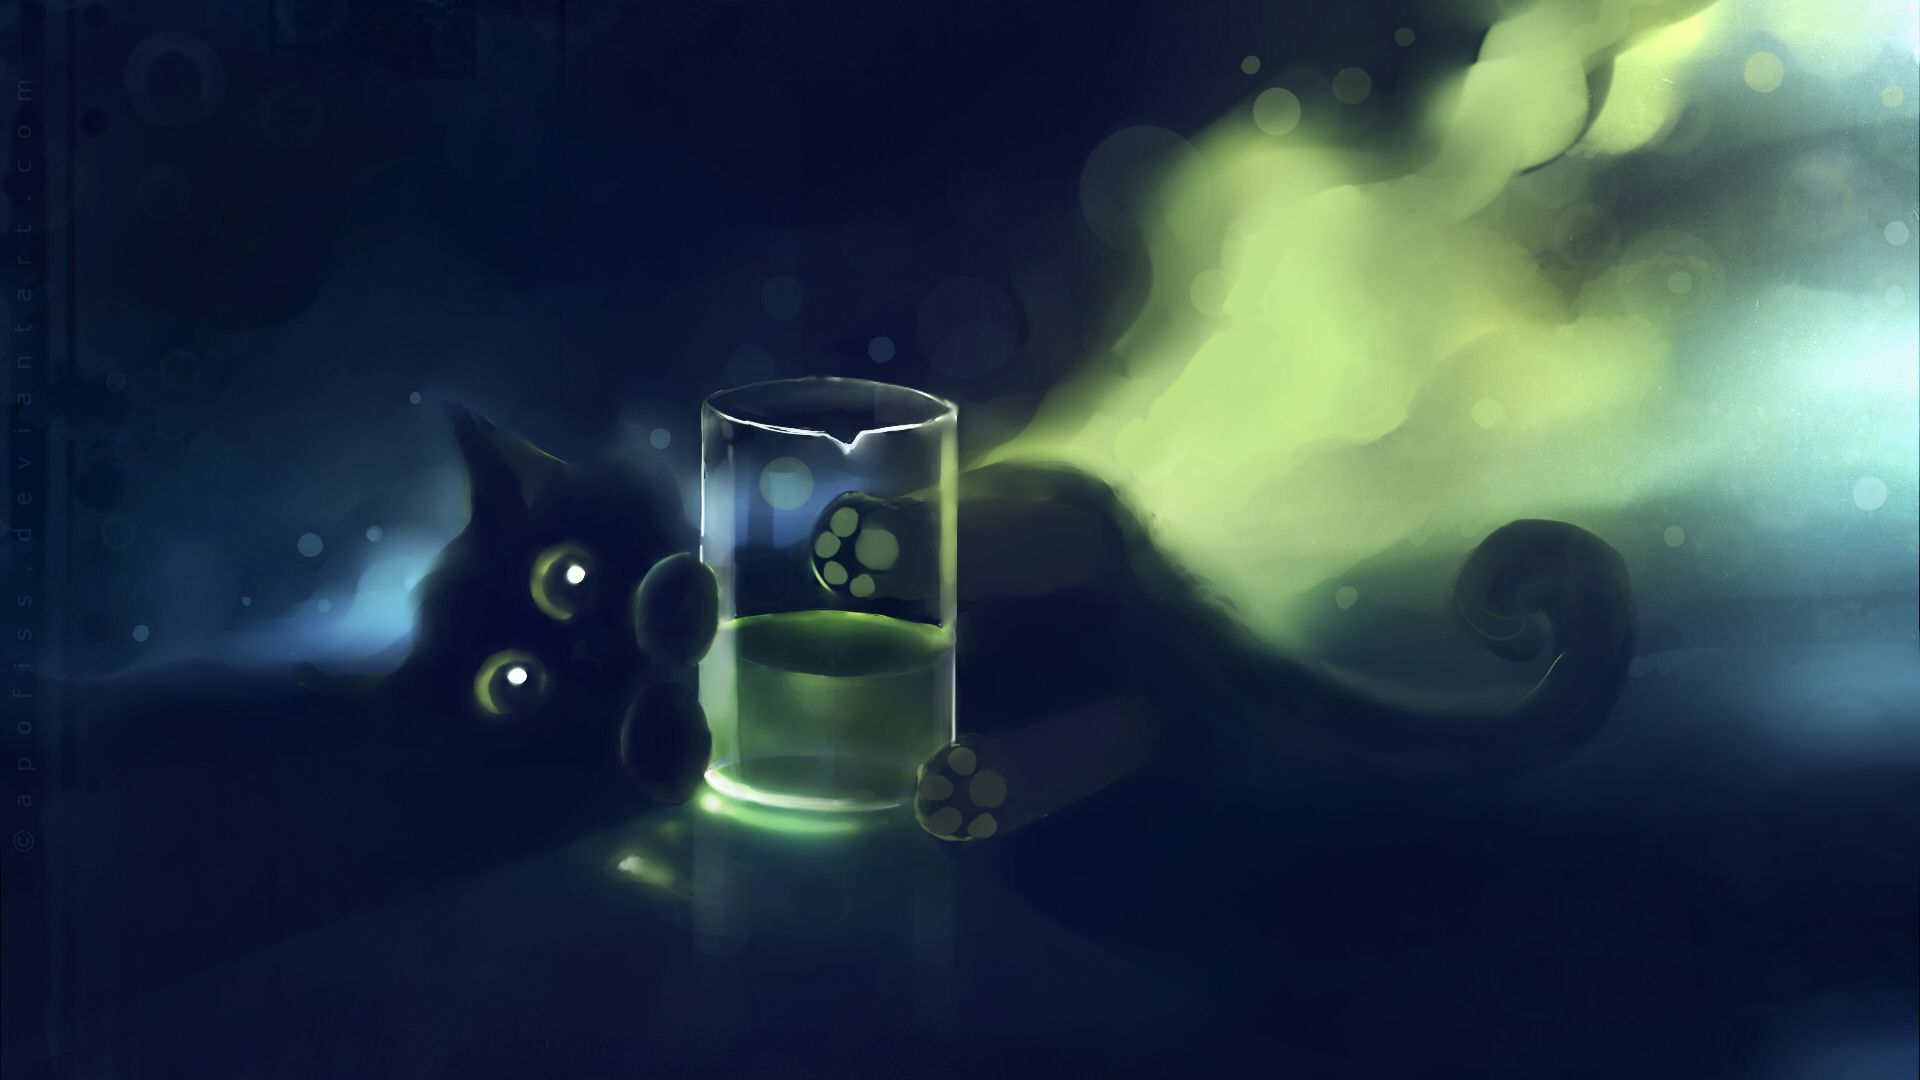 Cat, Black Cat, Deviantart, Artwork, Kittens View